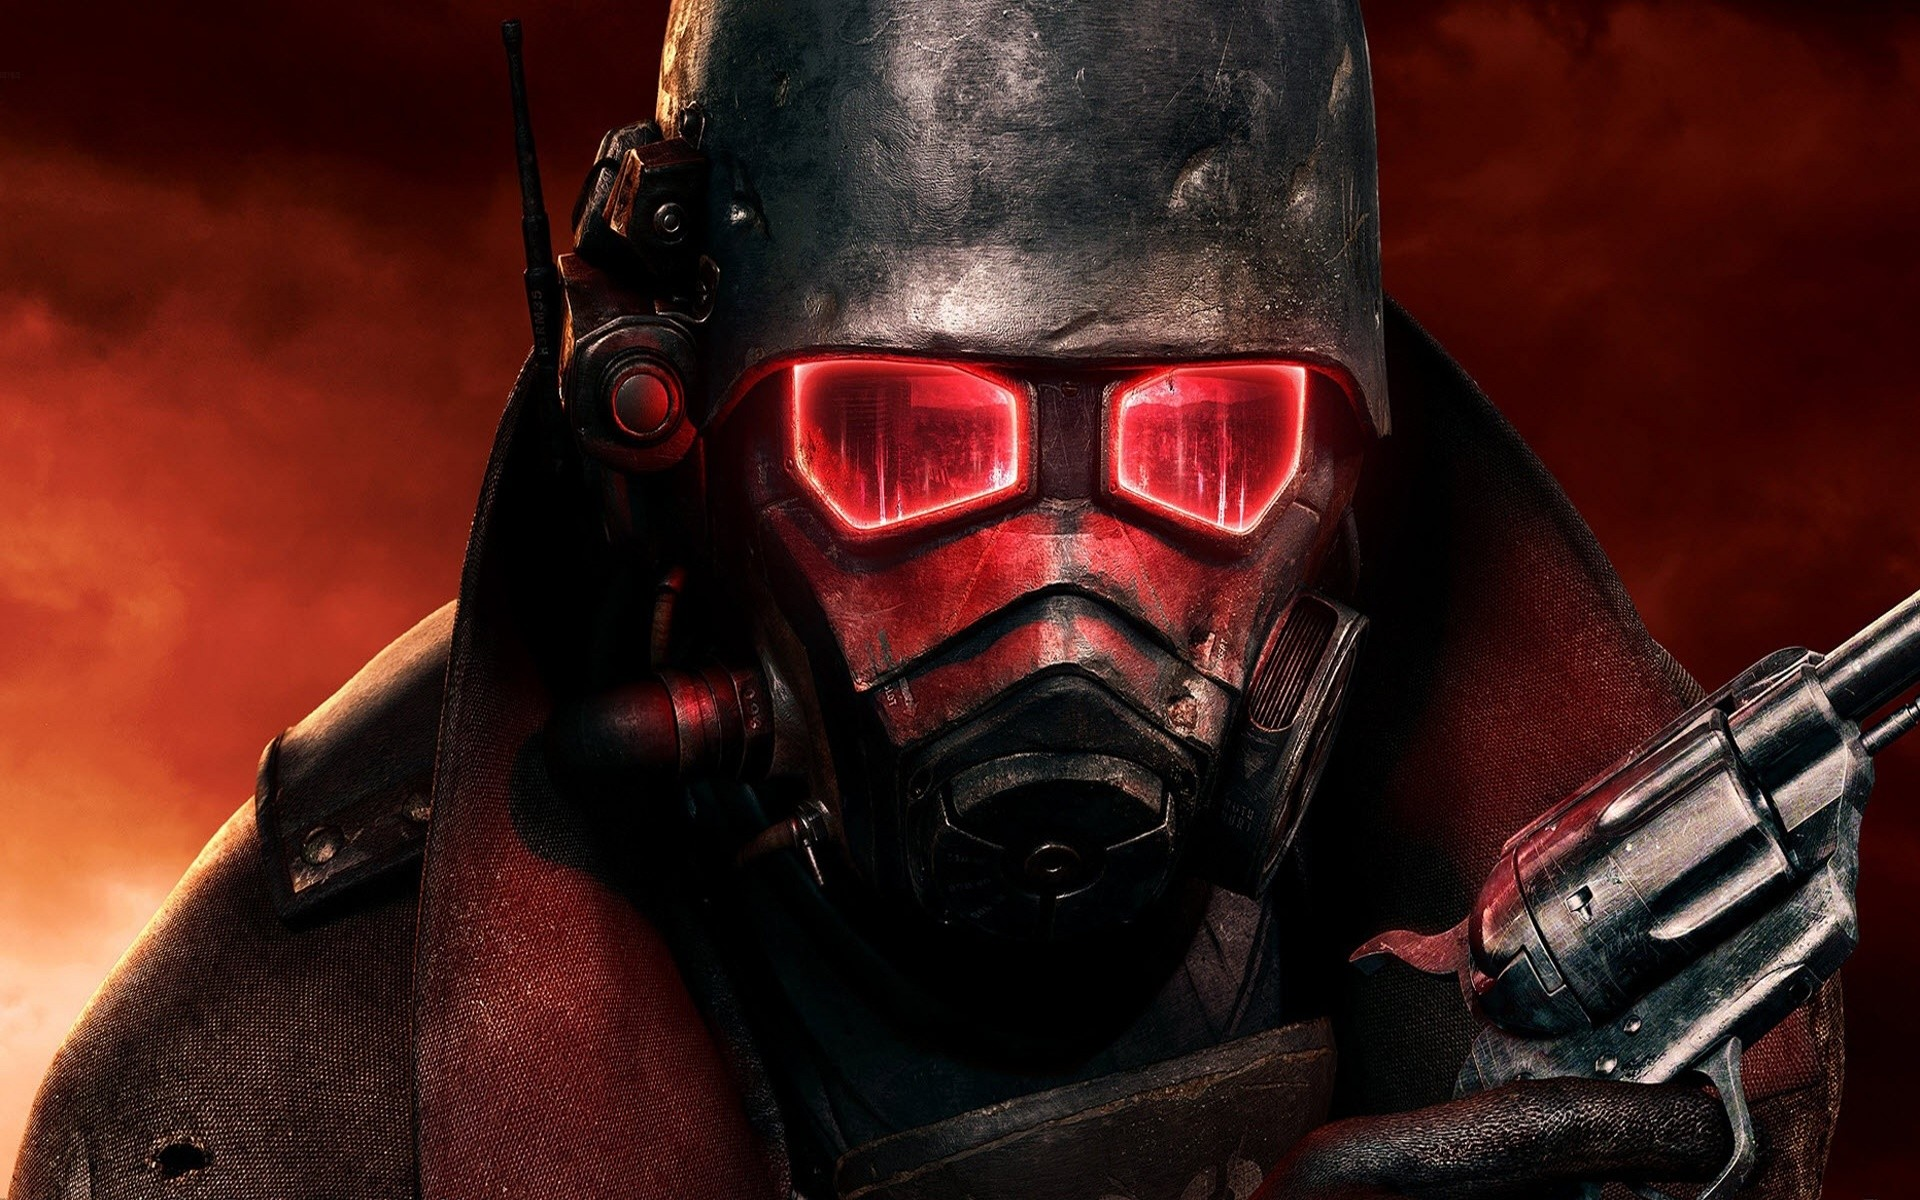 Previous: Fallout: New Vegas …